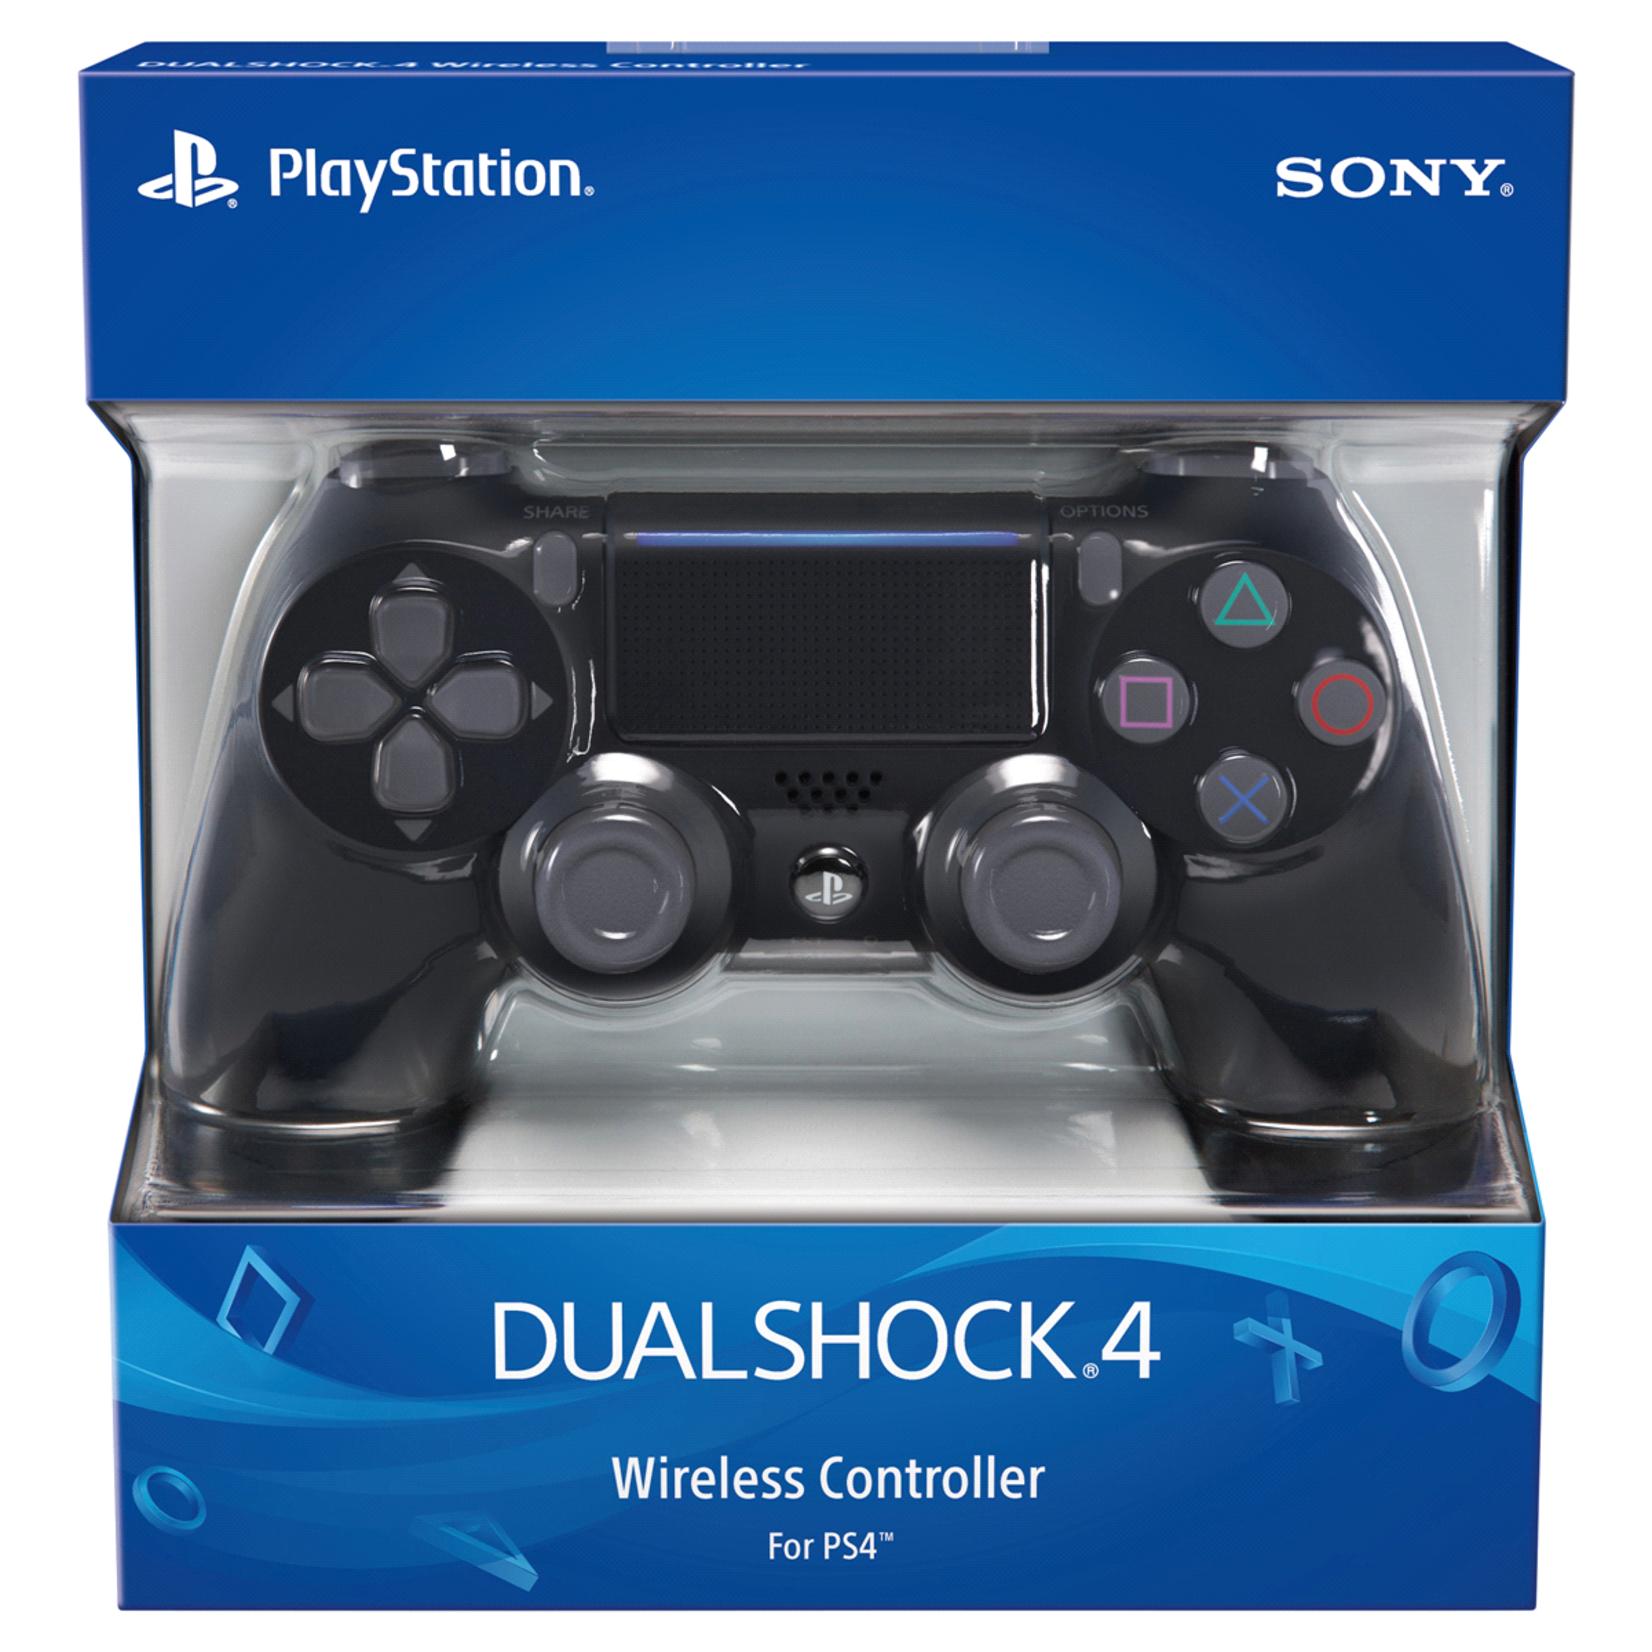 PS4-DUALSHOCK 4 WIRELESS CONTROLLER - BLACK